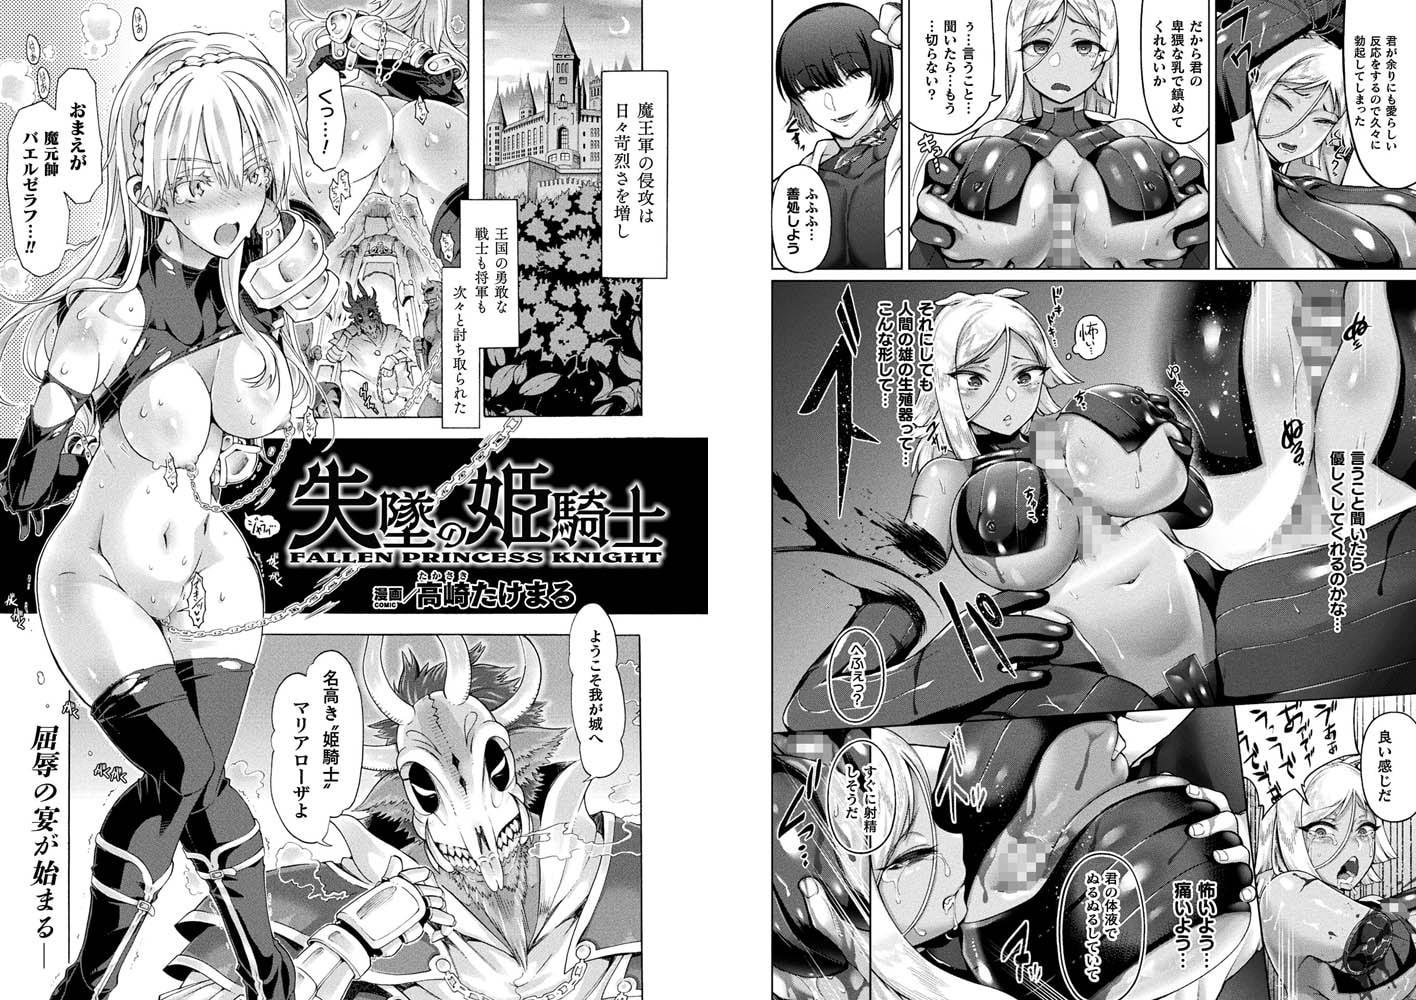 BJ236454 [20200331]コミックアンリアル Vol.84